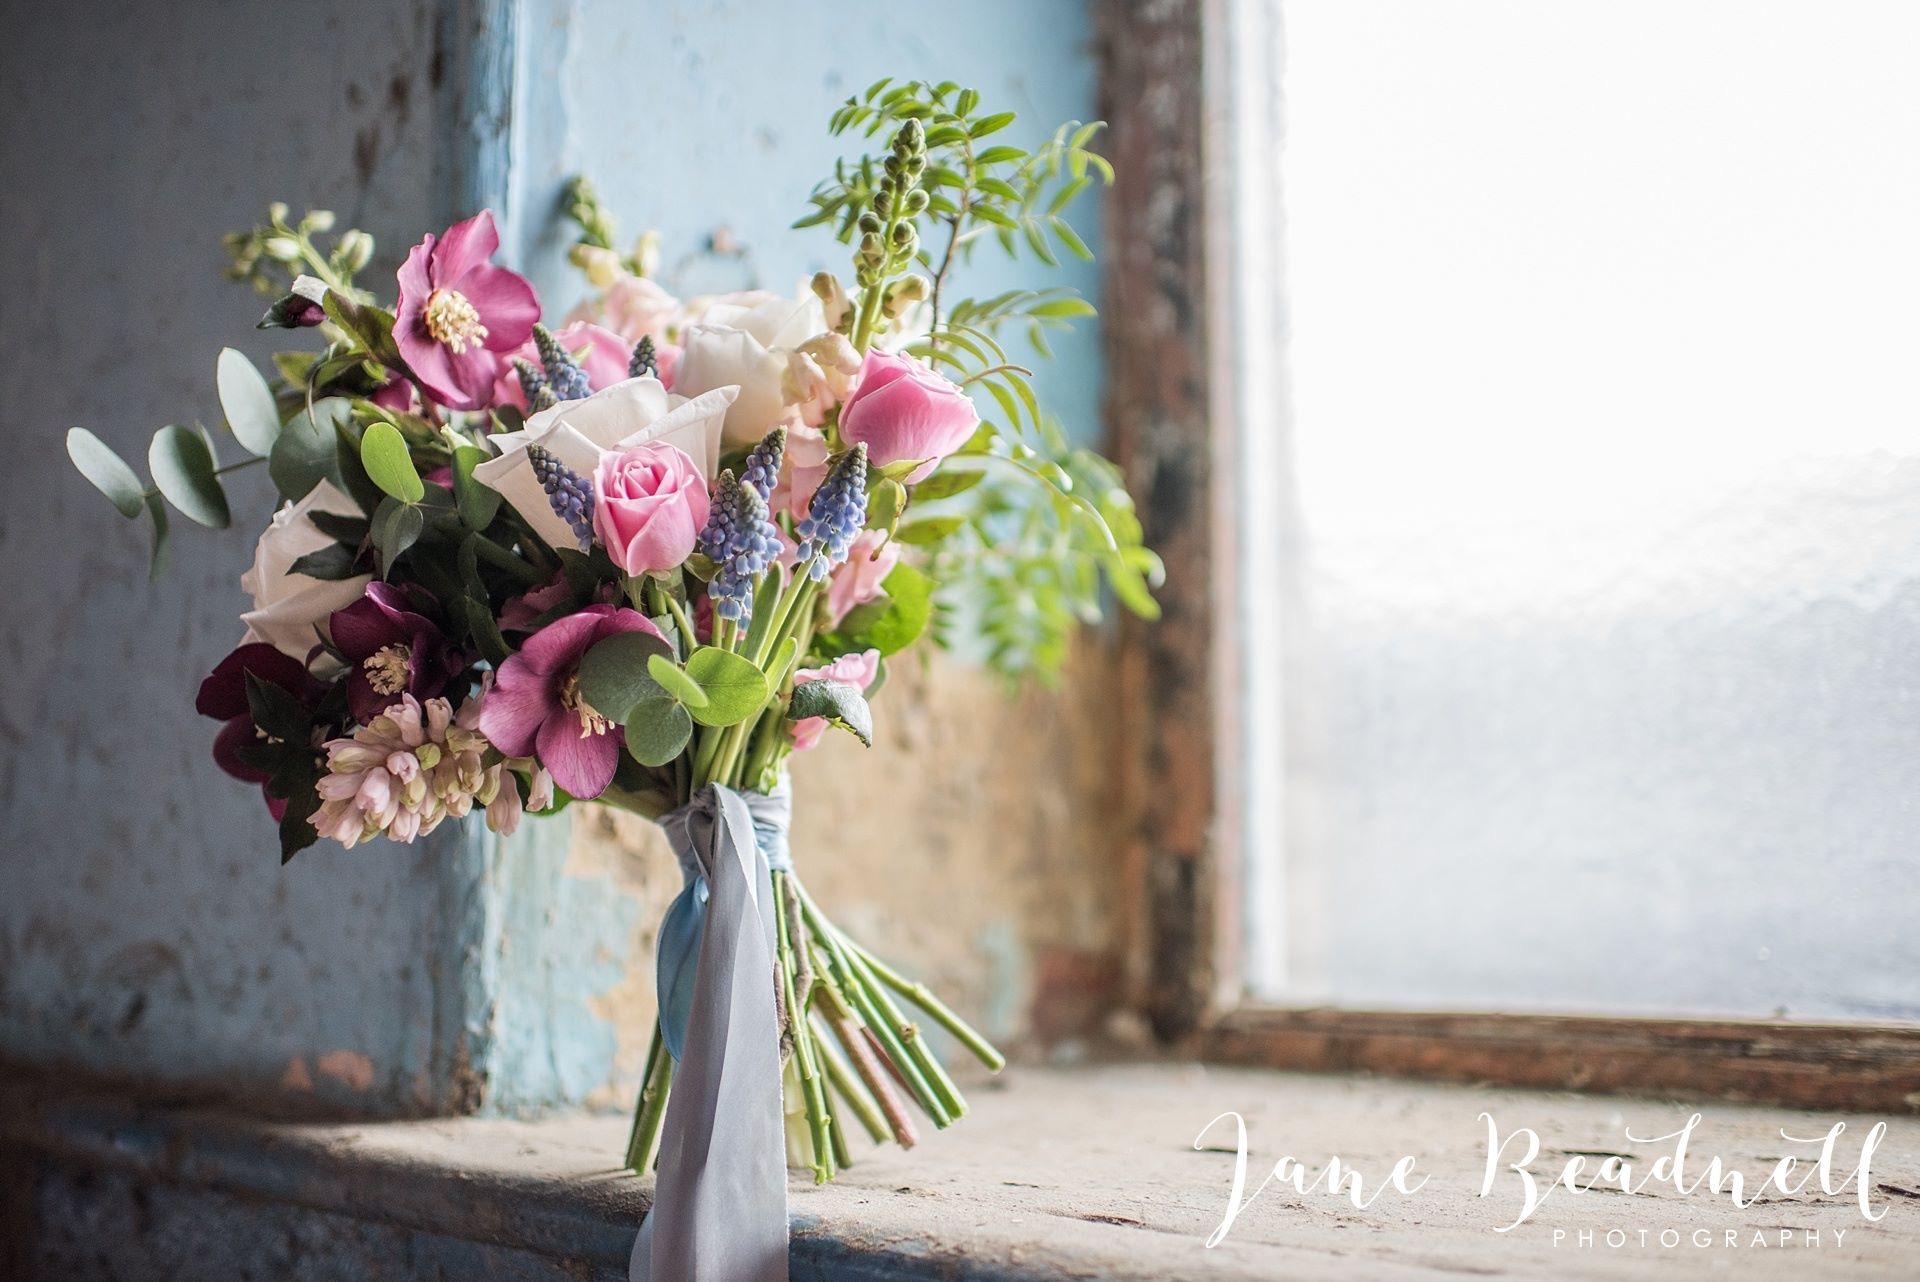 Jane Beadnell Photography